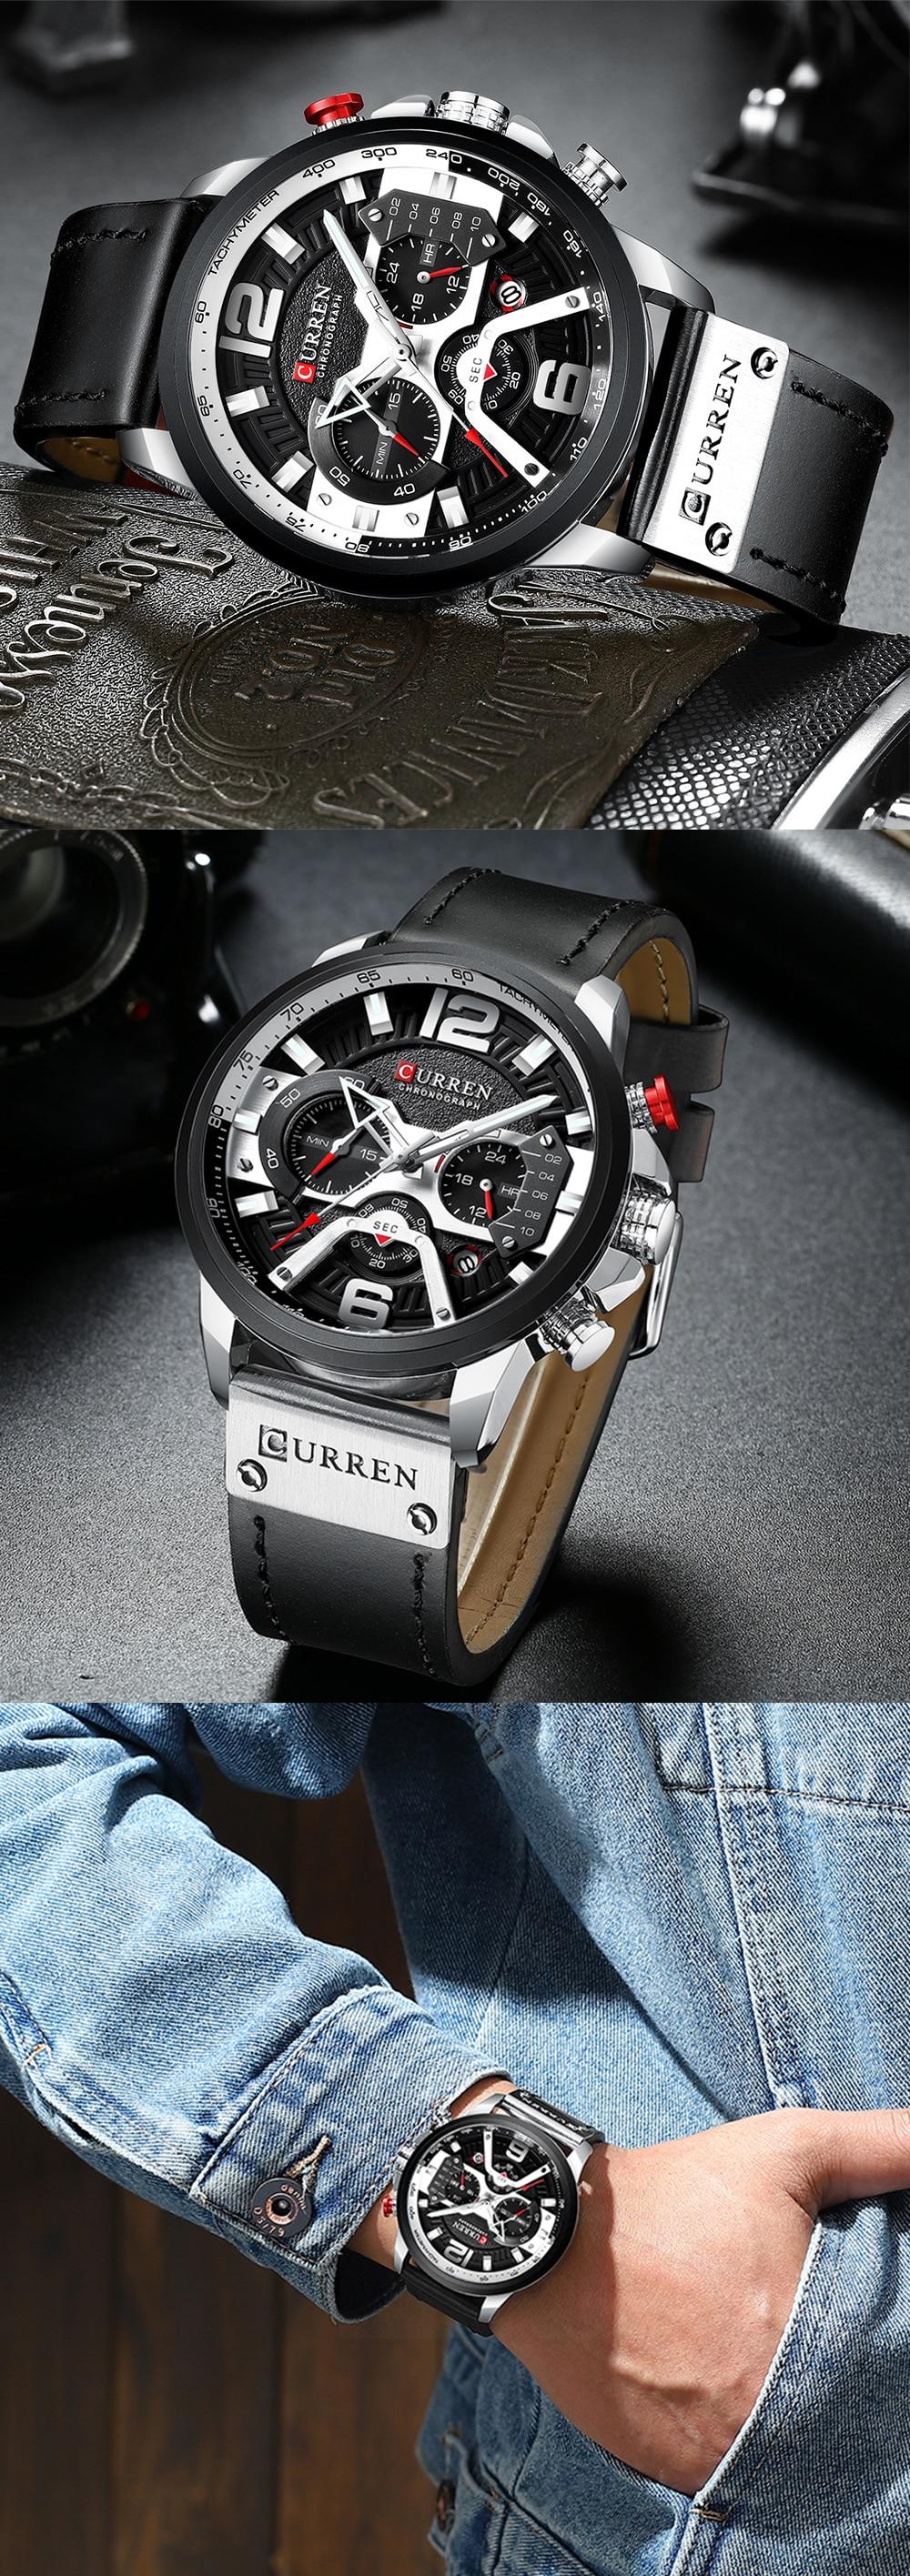 HTB1Mqt8KAzoK1RjSZFlq6yi4VXad CURREN Casual Sport Watches for Men Blue Top Brand Luxury Military Leather Wrist Watch Man Clock Fashion Chronograph Wristwatch